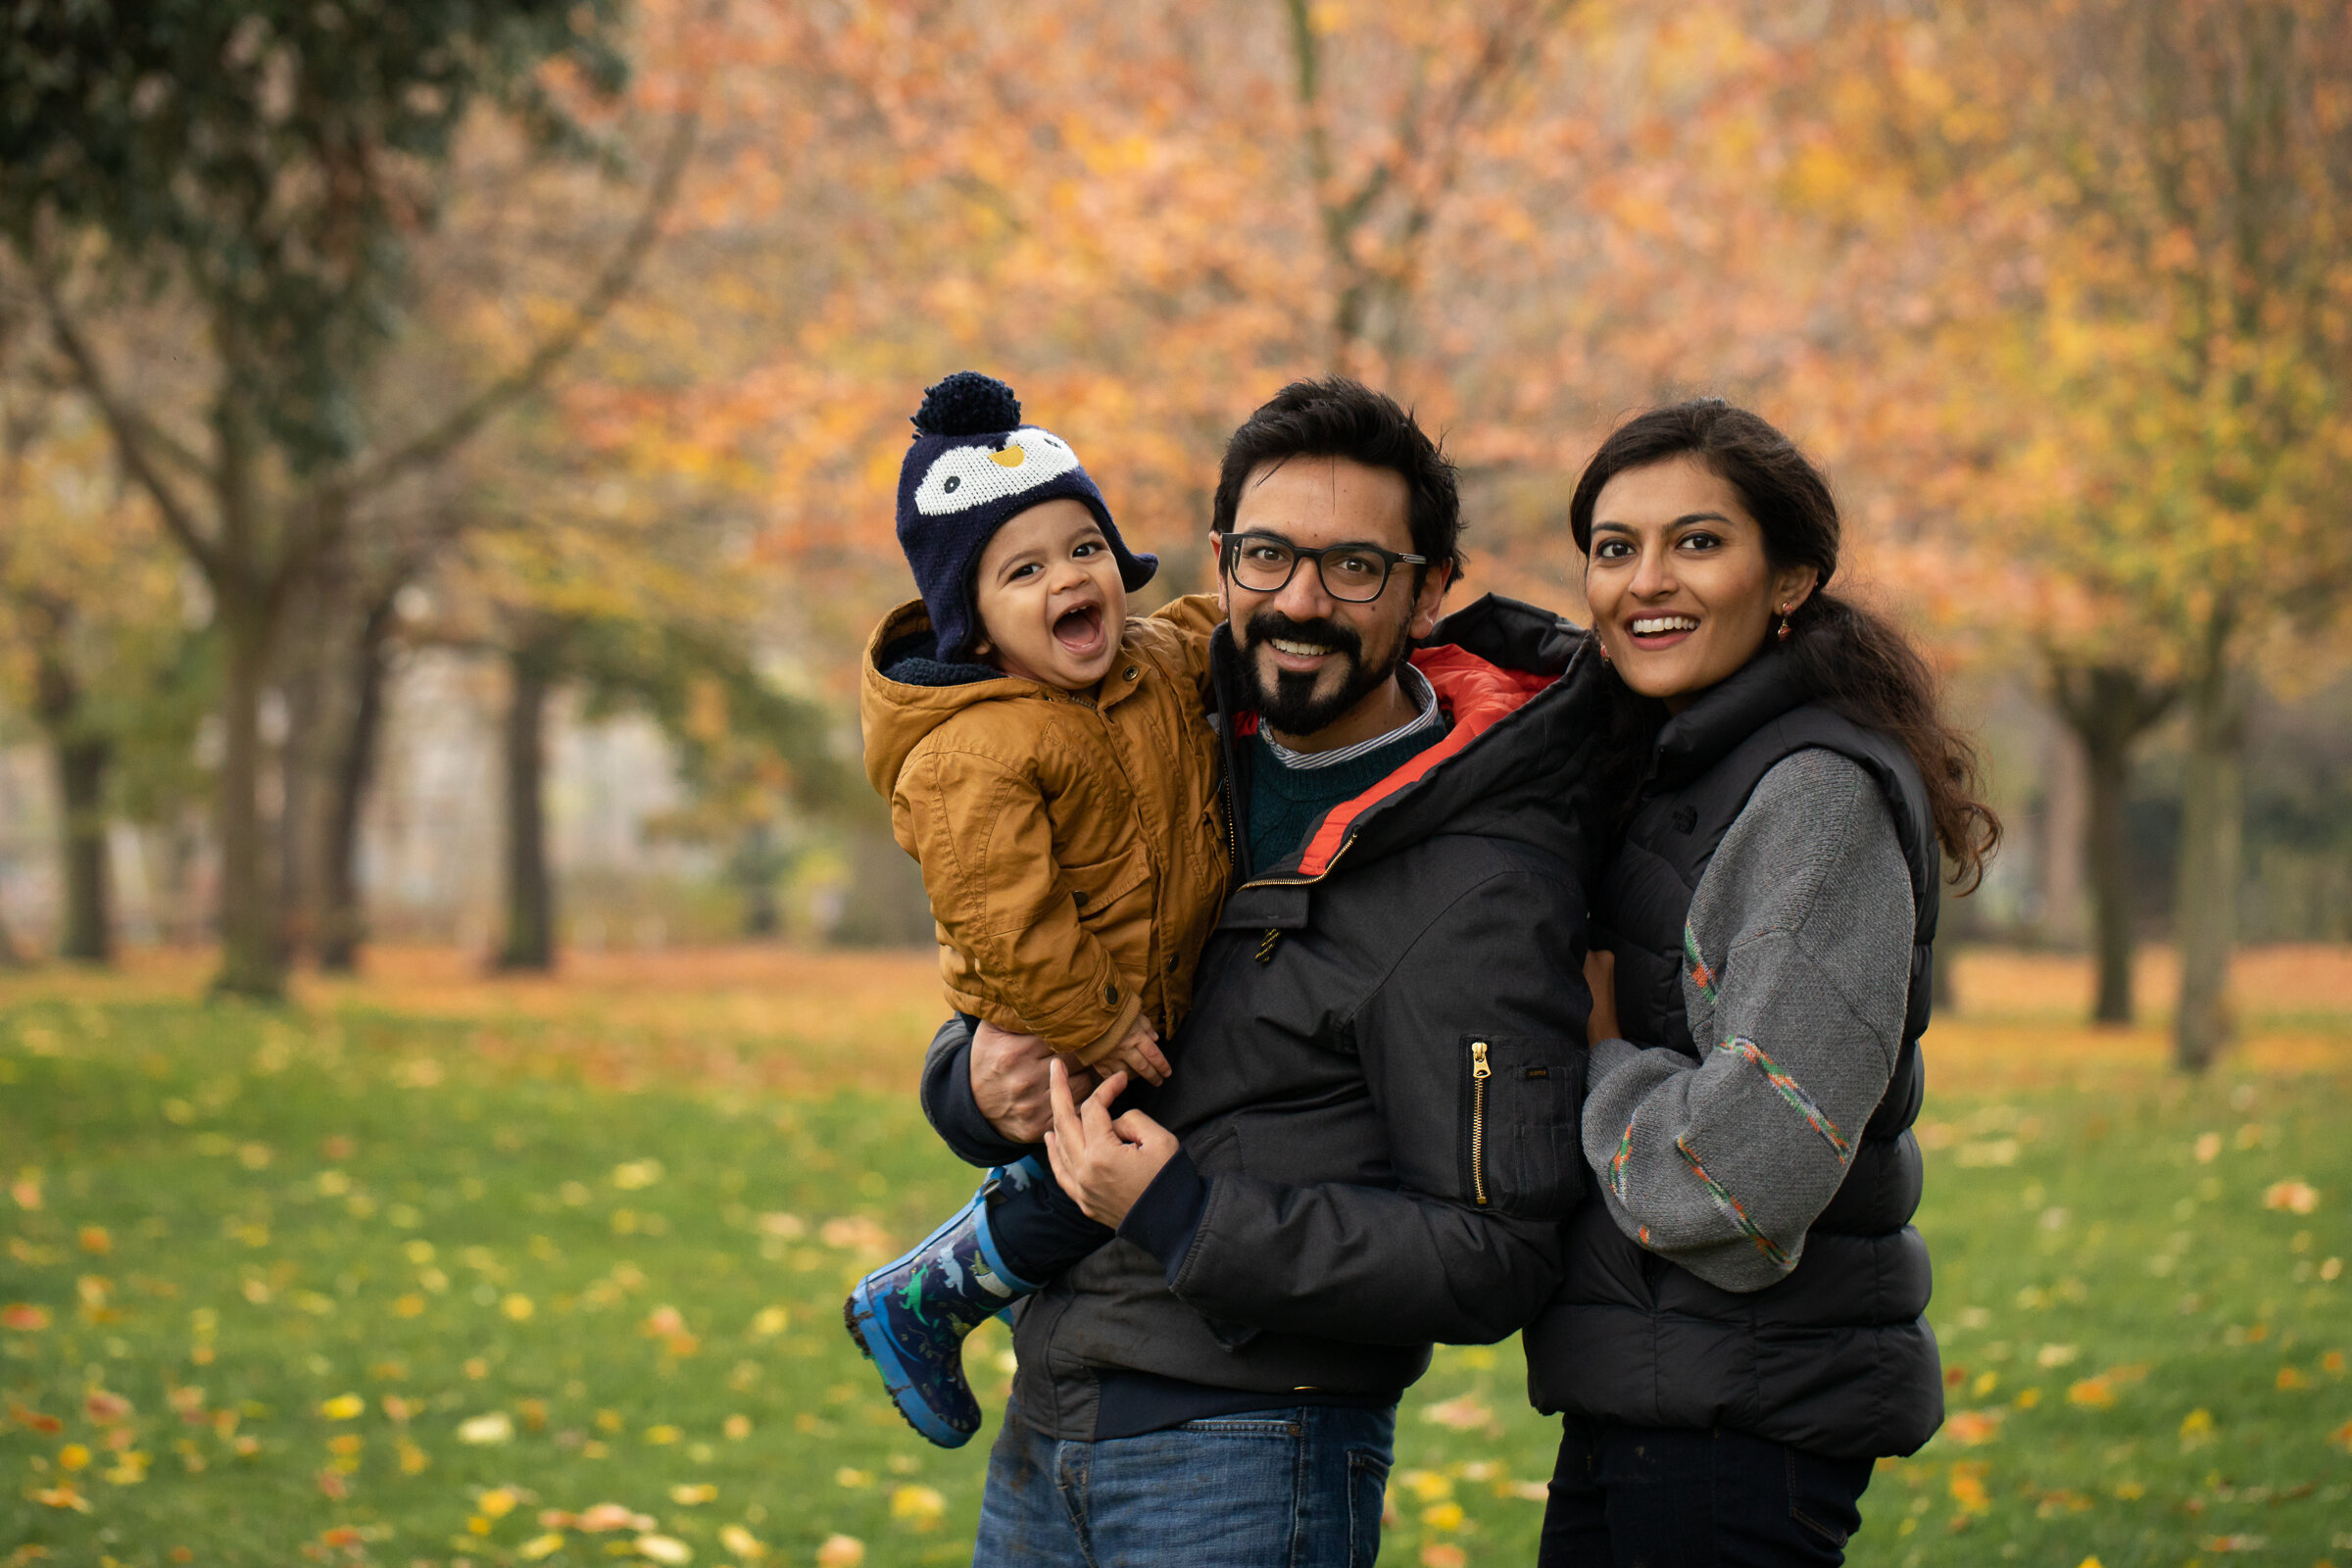 autumn-colours-outdoors-family-photo-london-hackney.jpg